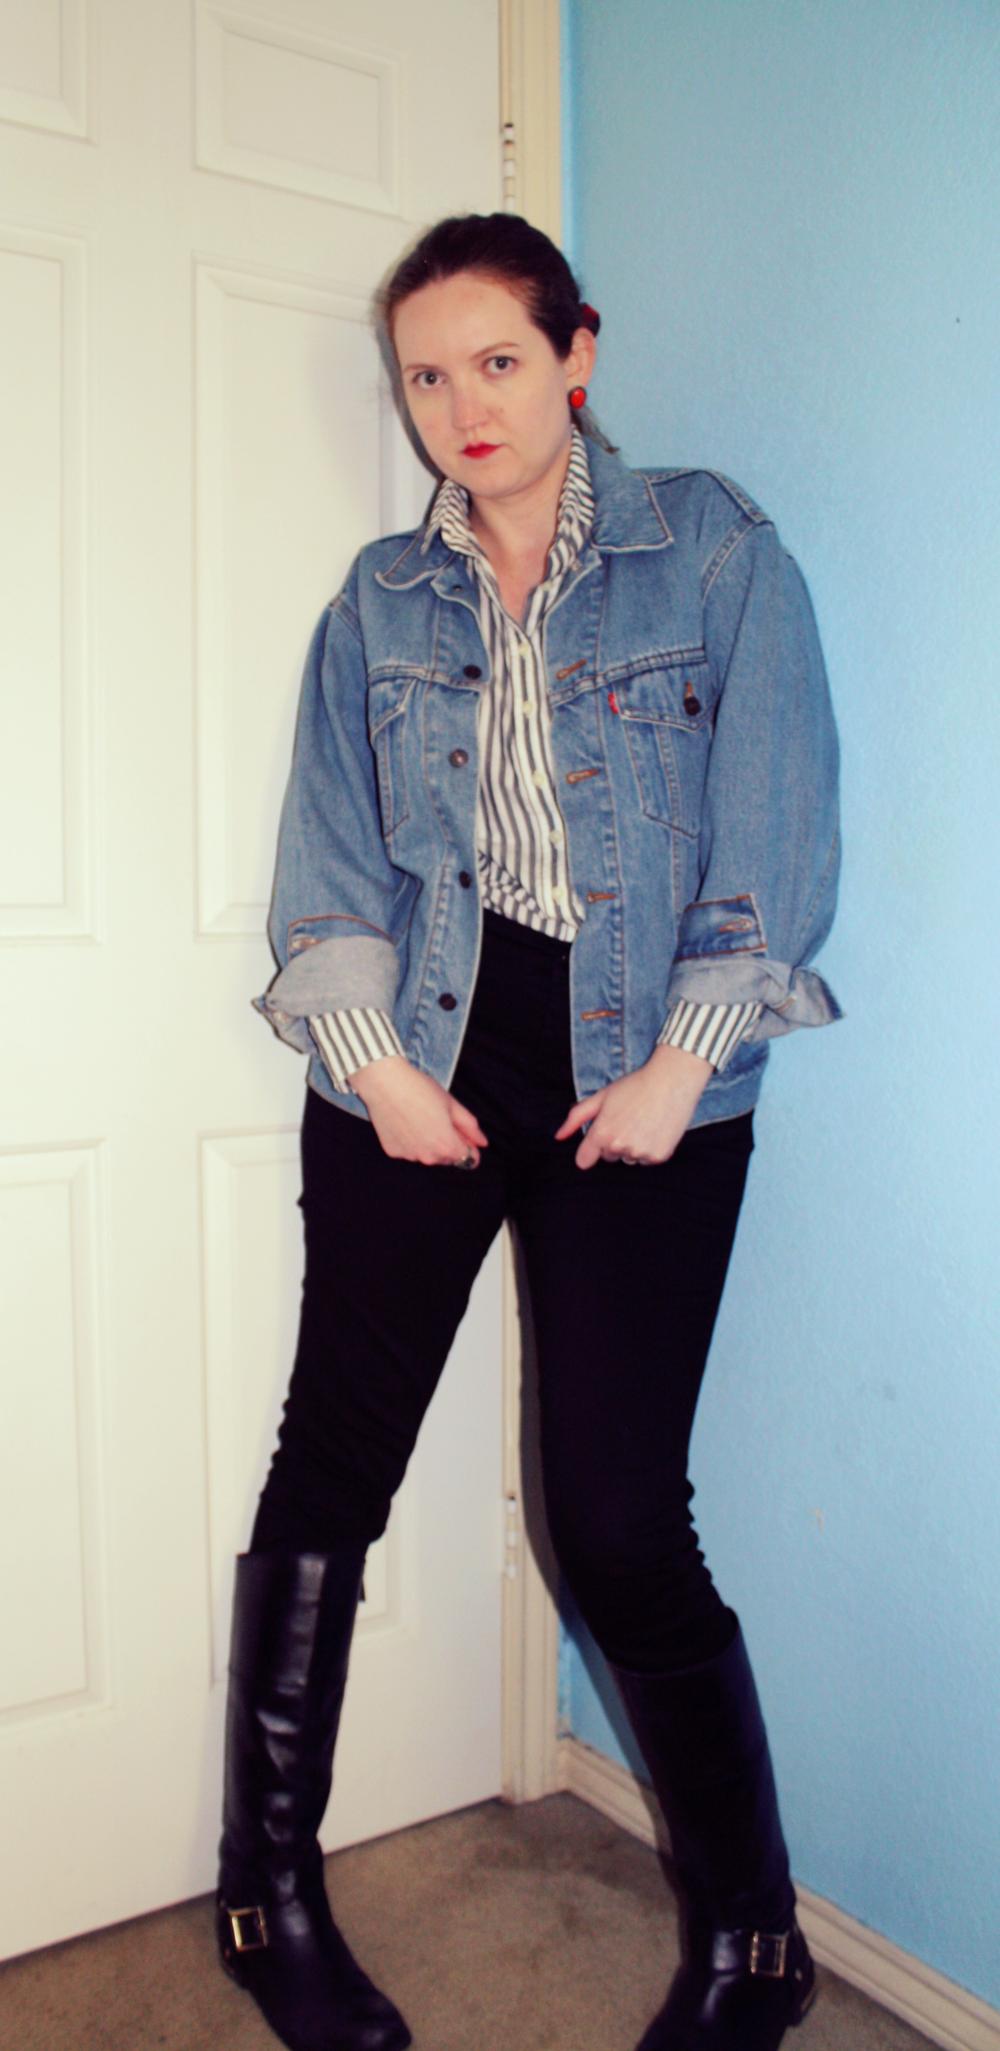 Vintage Levi's Denim Jacket + Tradlands Striped Button Down Shirt + Madewell Black Skinny Jeans + Vince Camuto Boots